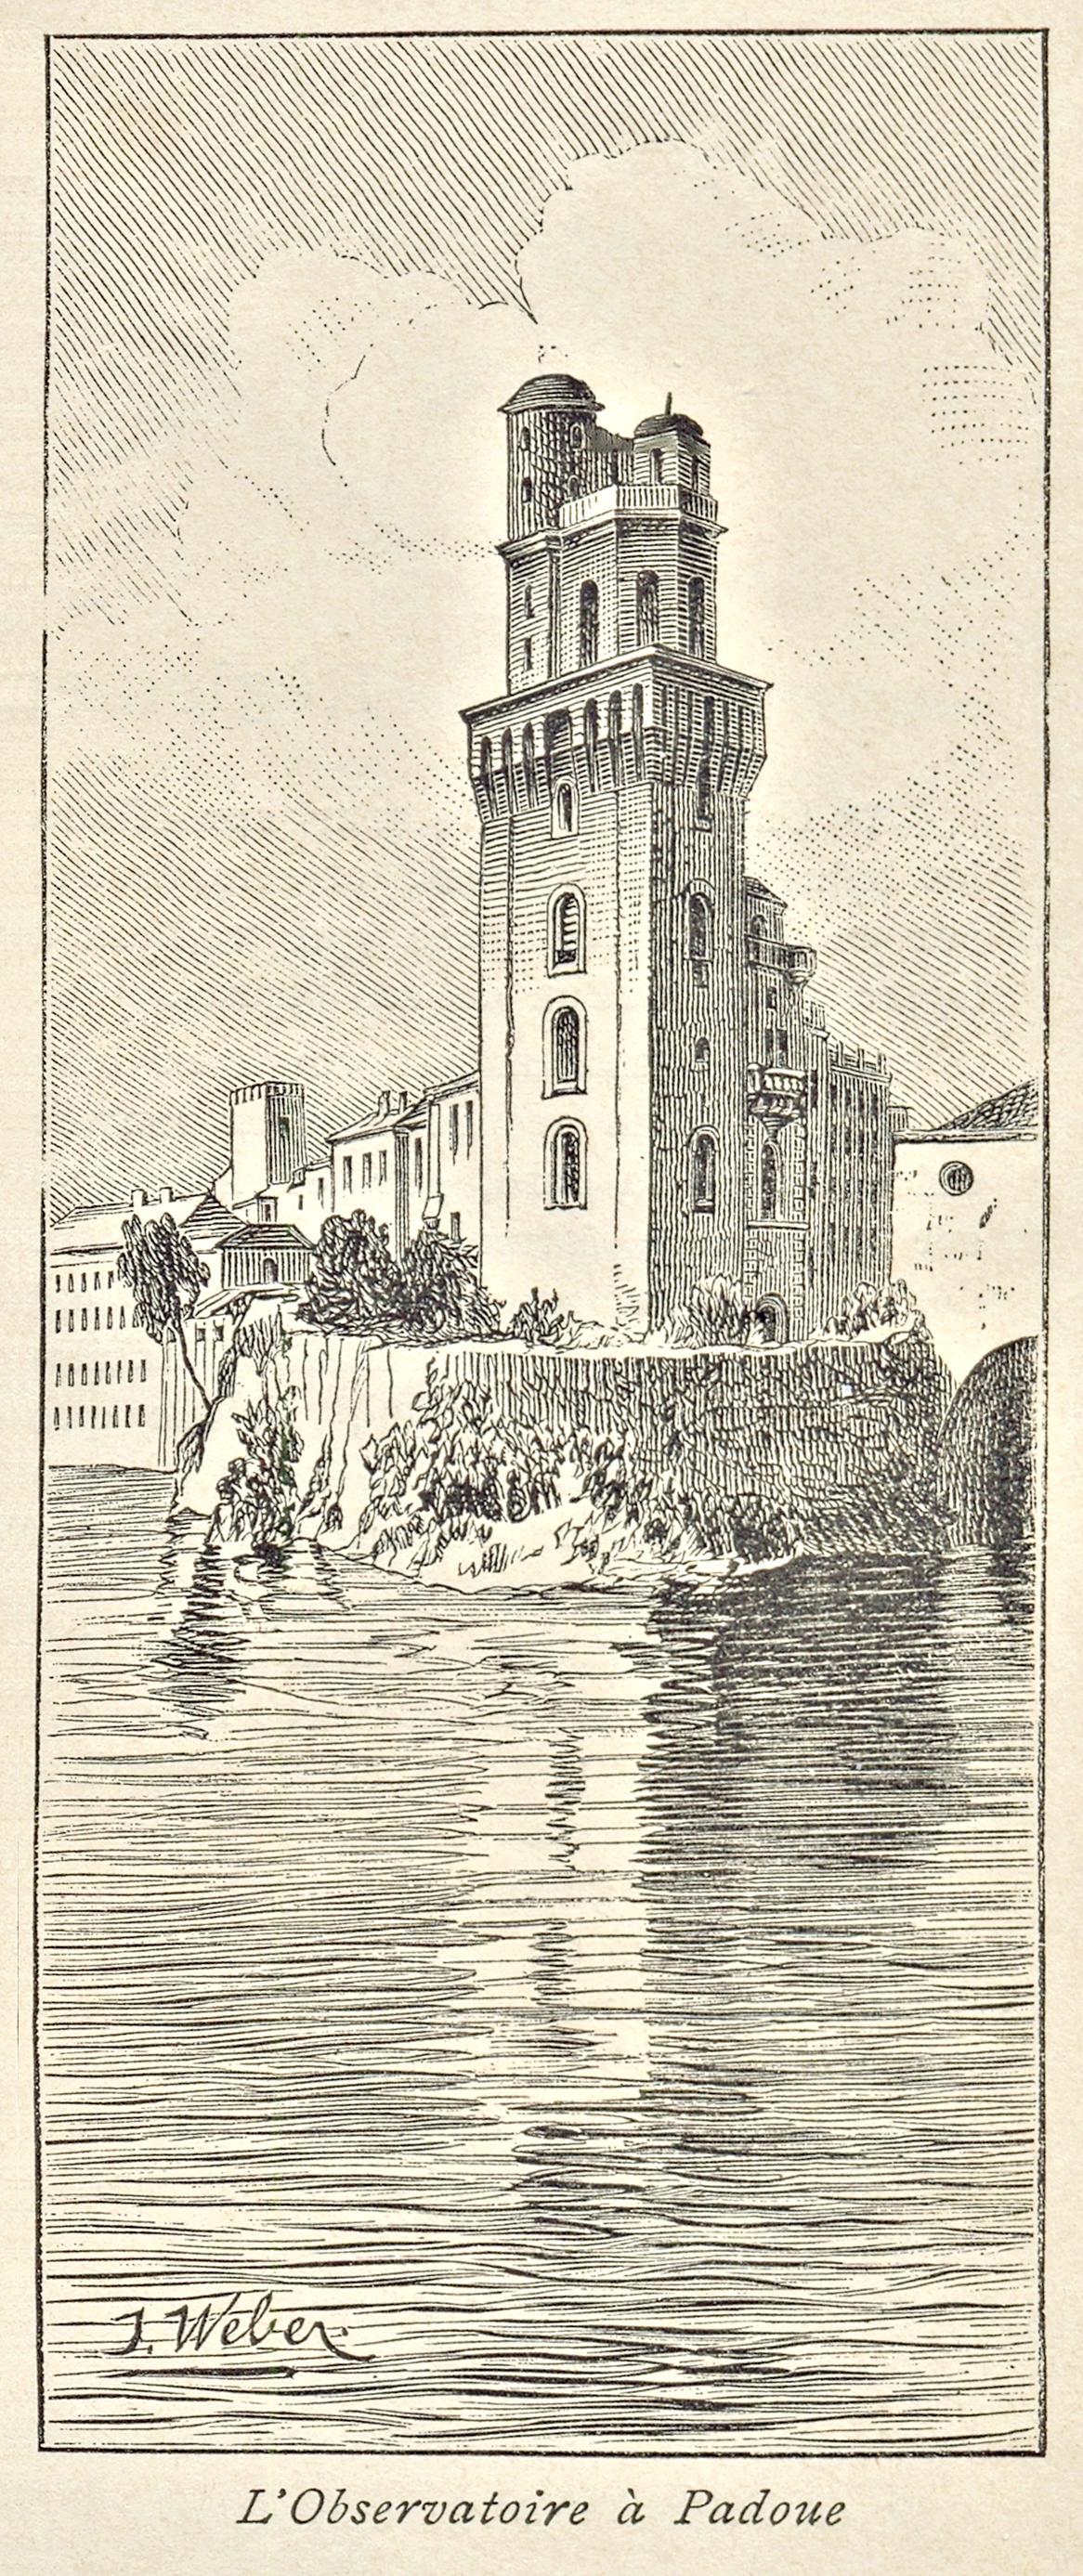 La Torlonga, antica torre di difesa medievale di Padova.